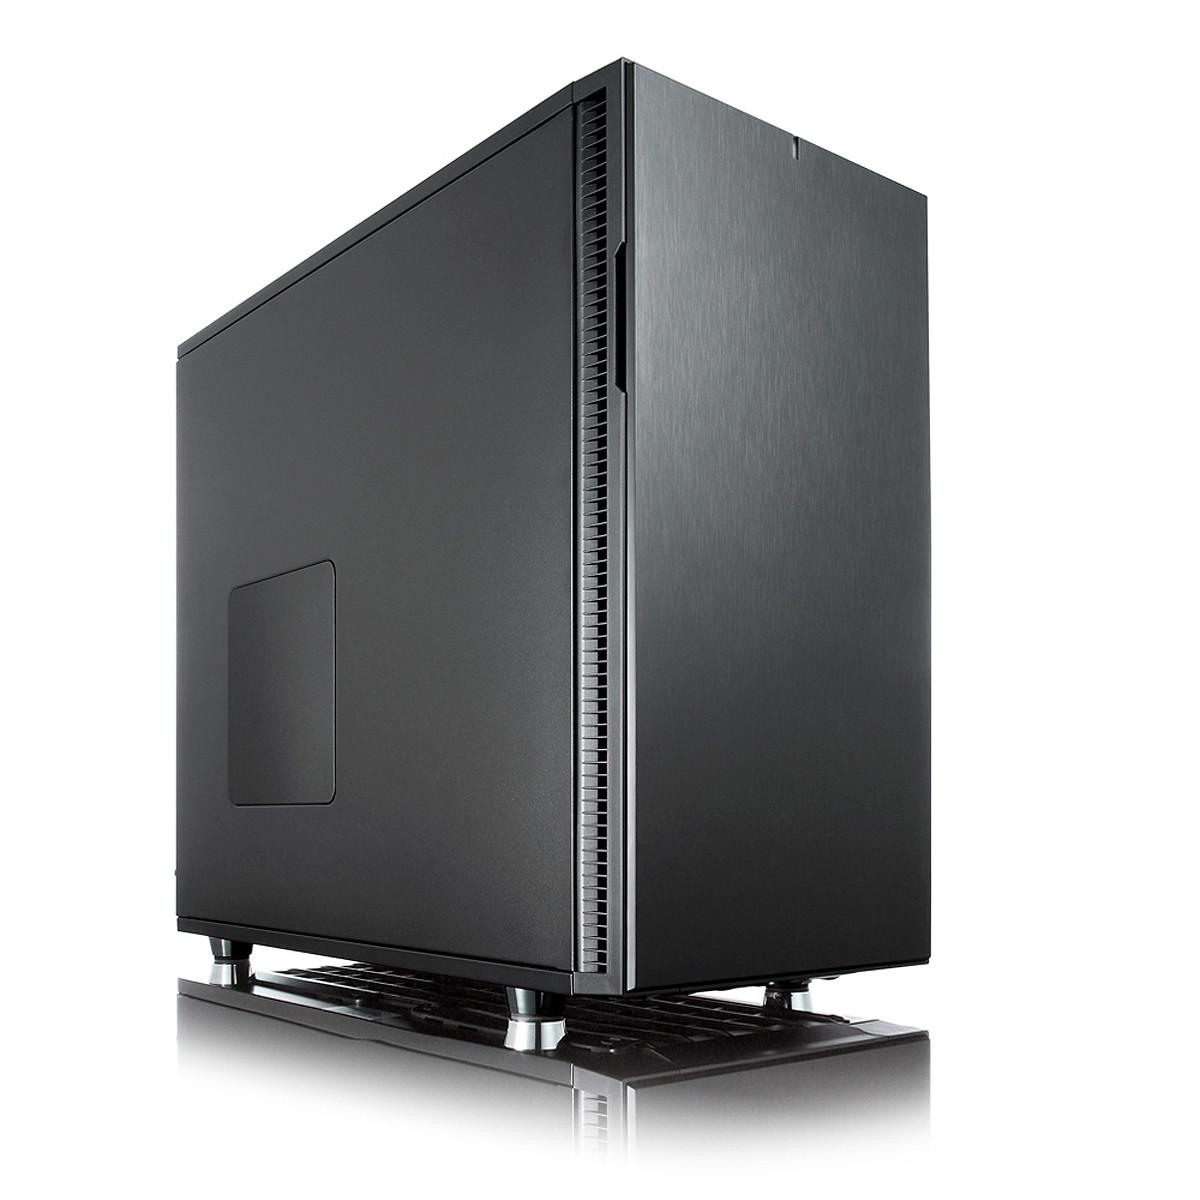 SimBin Unreal Engine 4 Gaming Desktop (Developer)